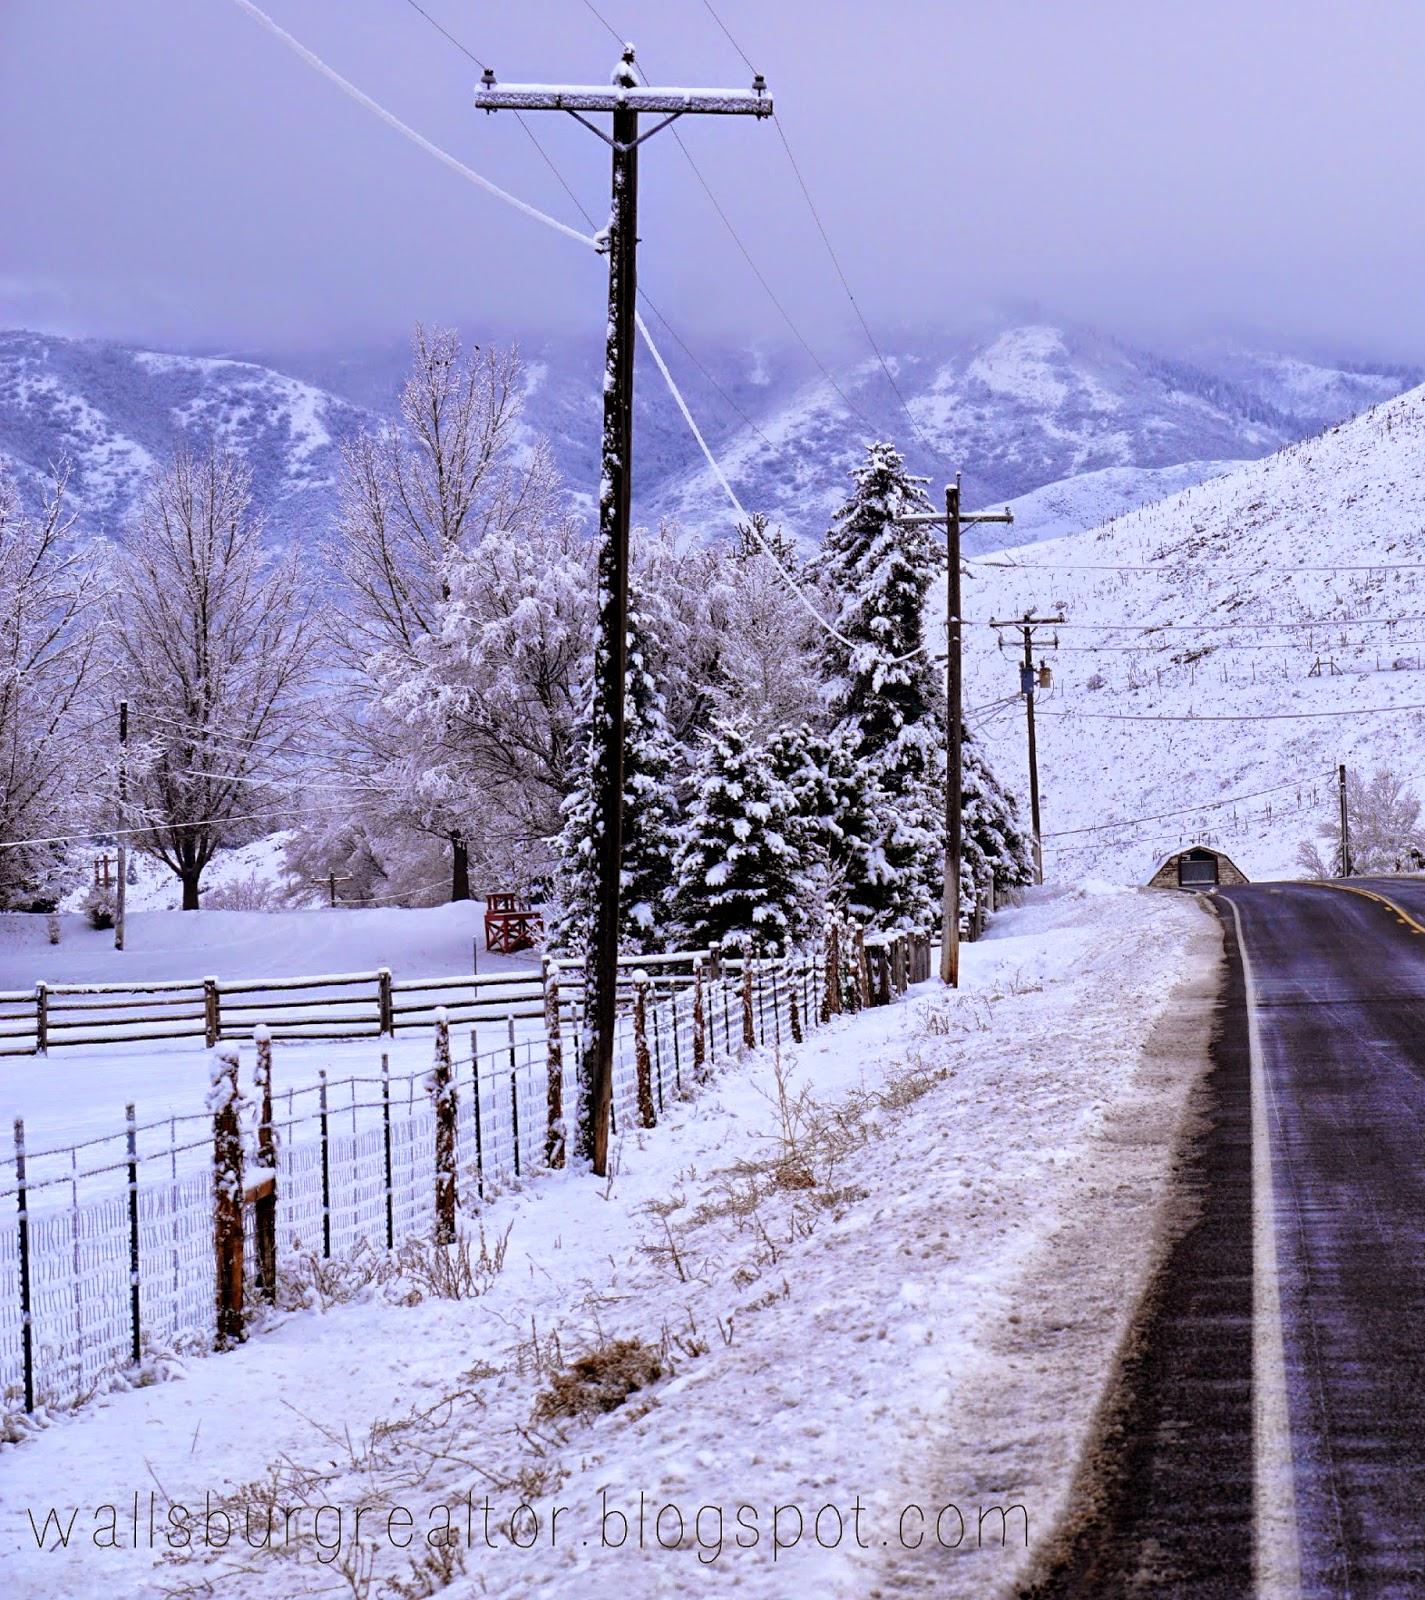 Snow Day in Wallsburg, Utah